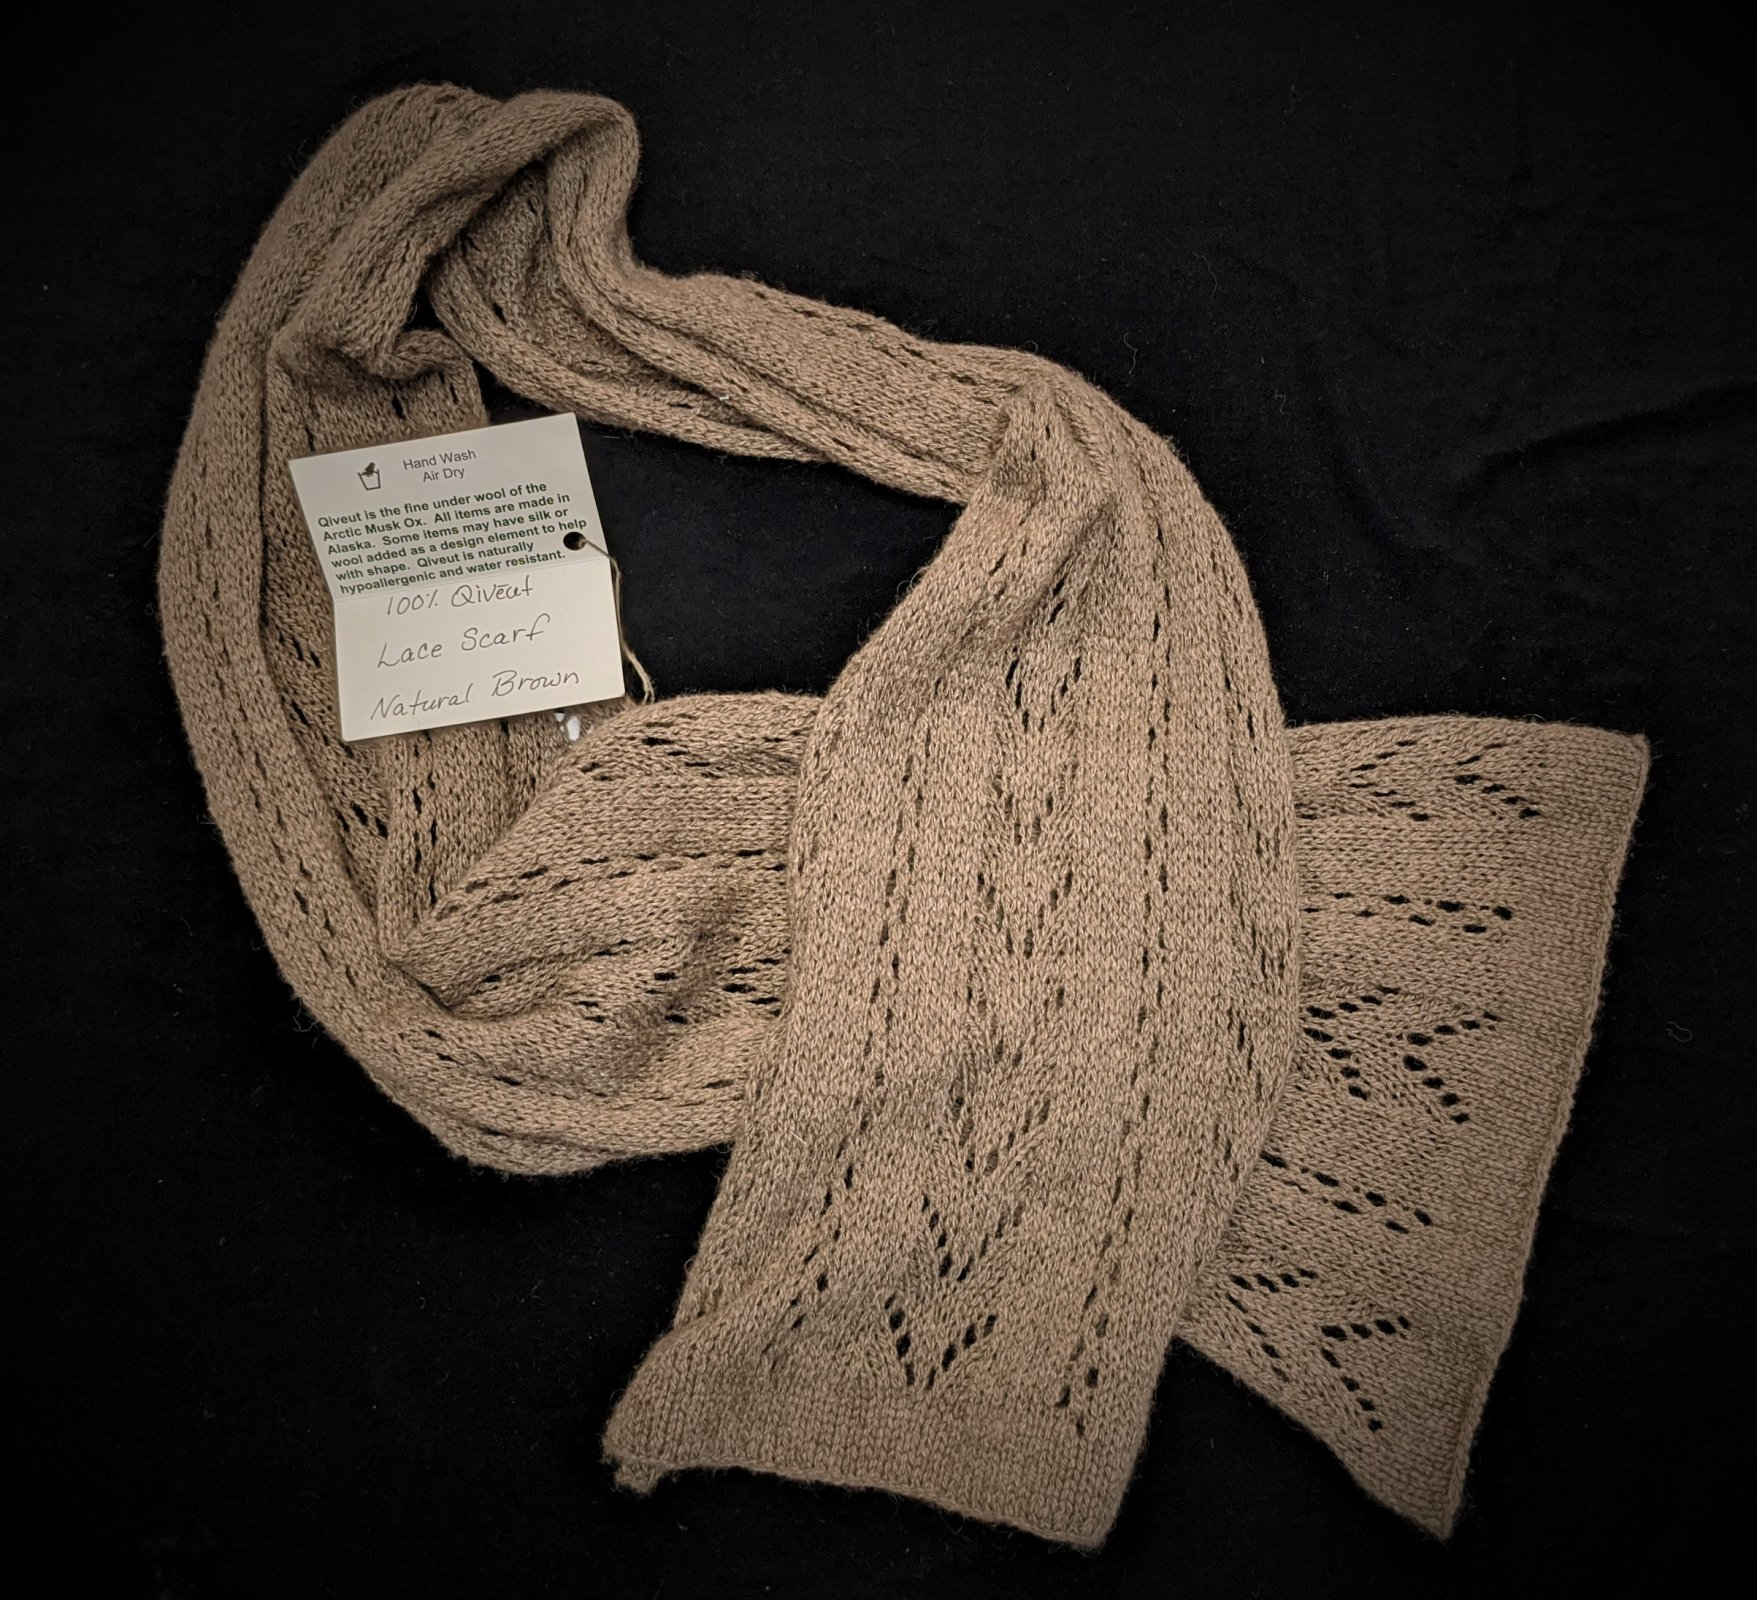 Qiveut Lace Scarf - Natural Brown